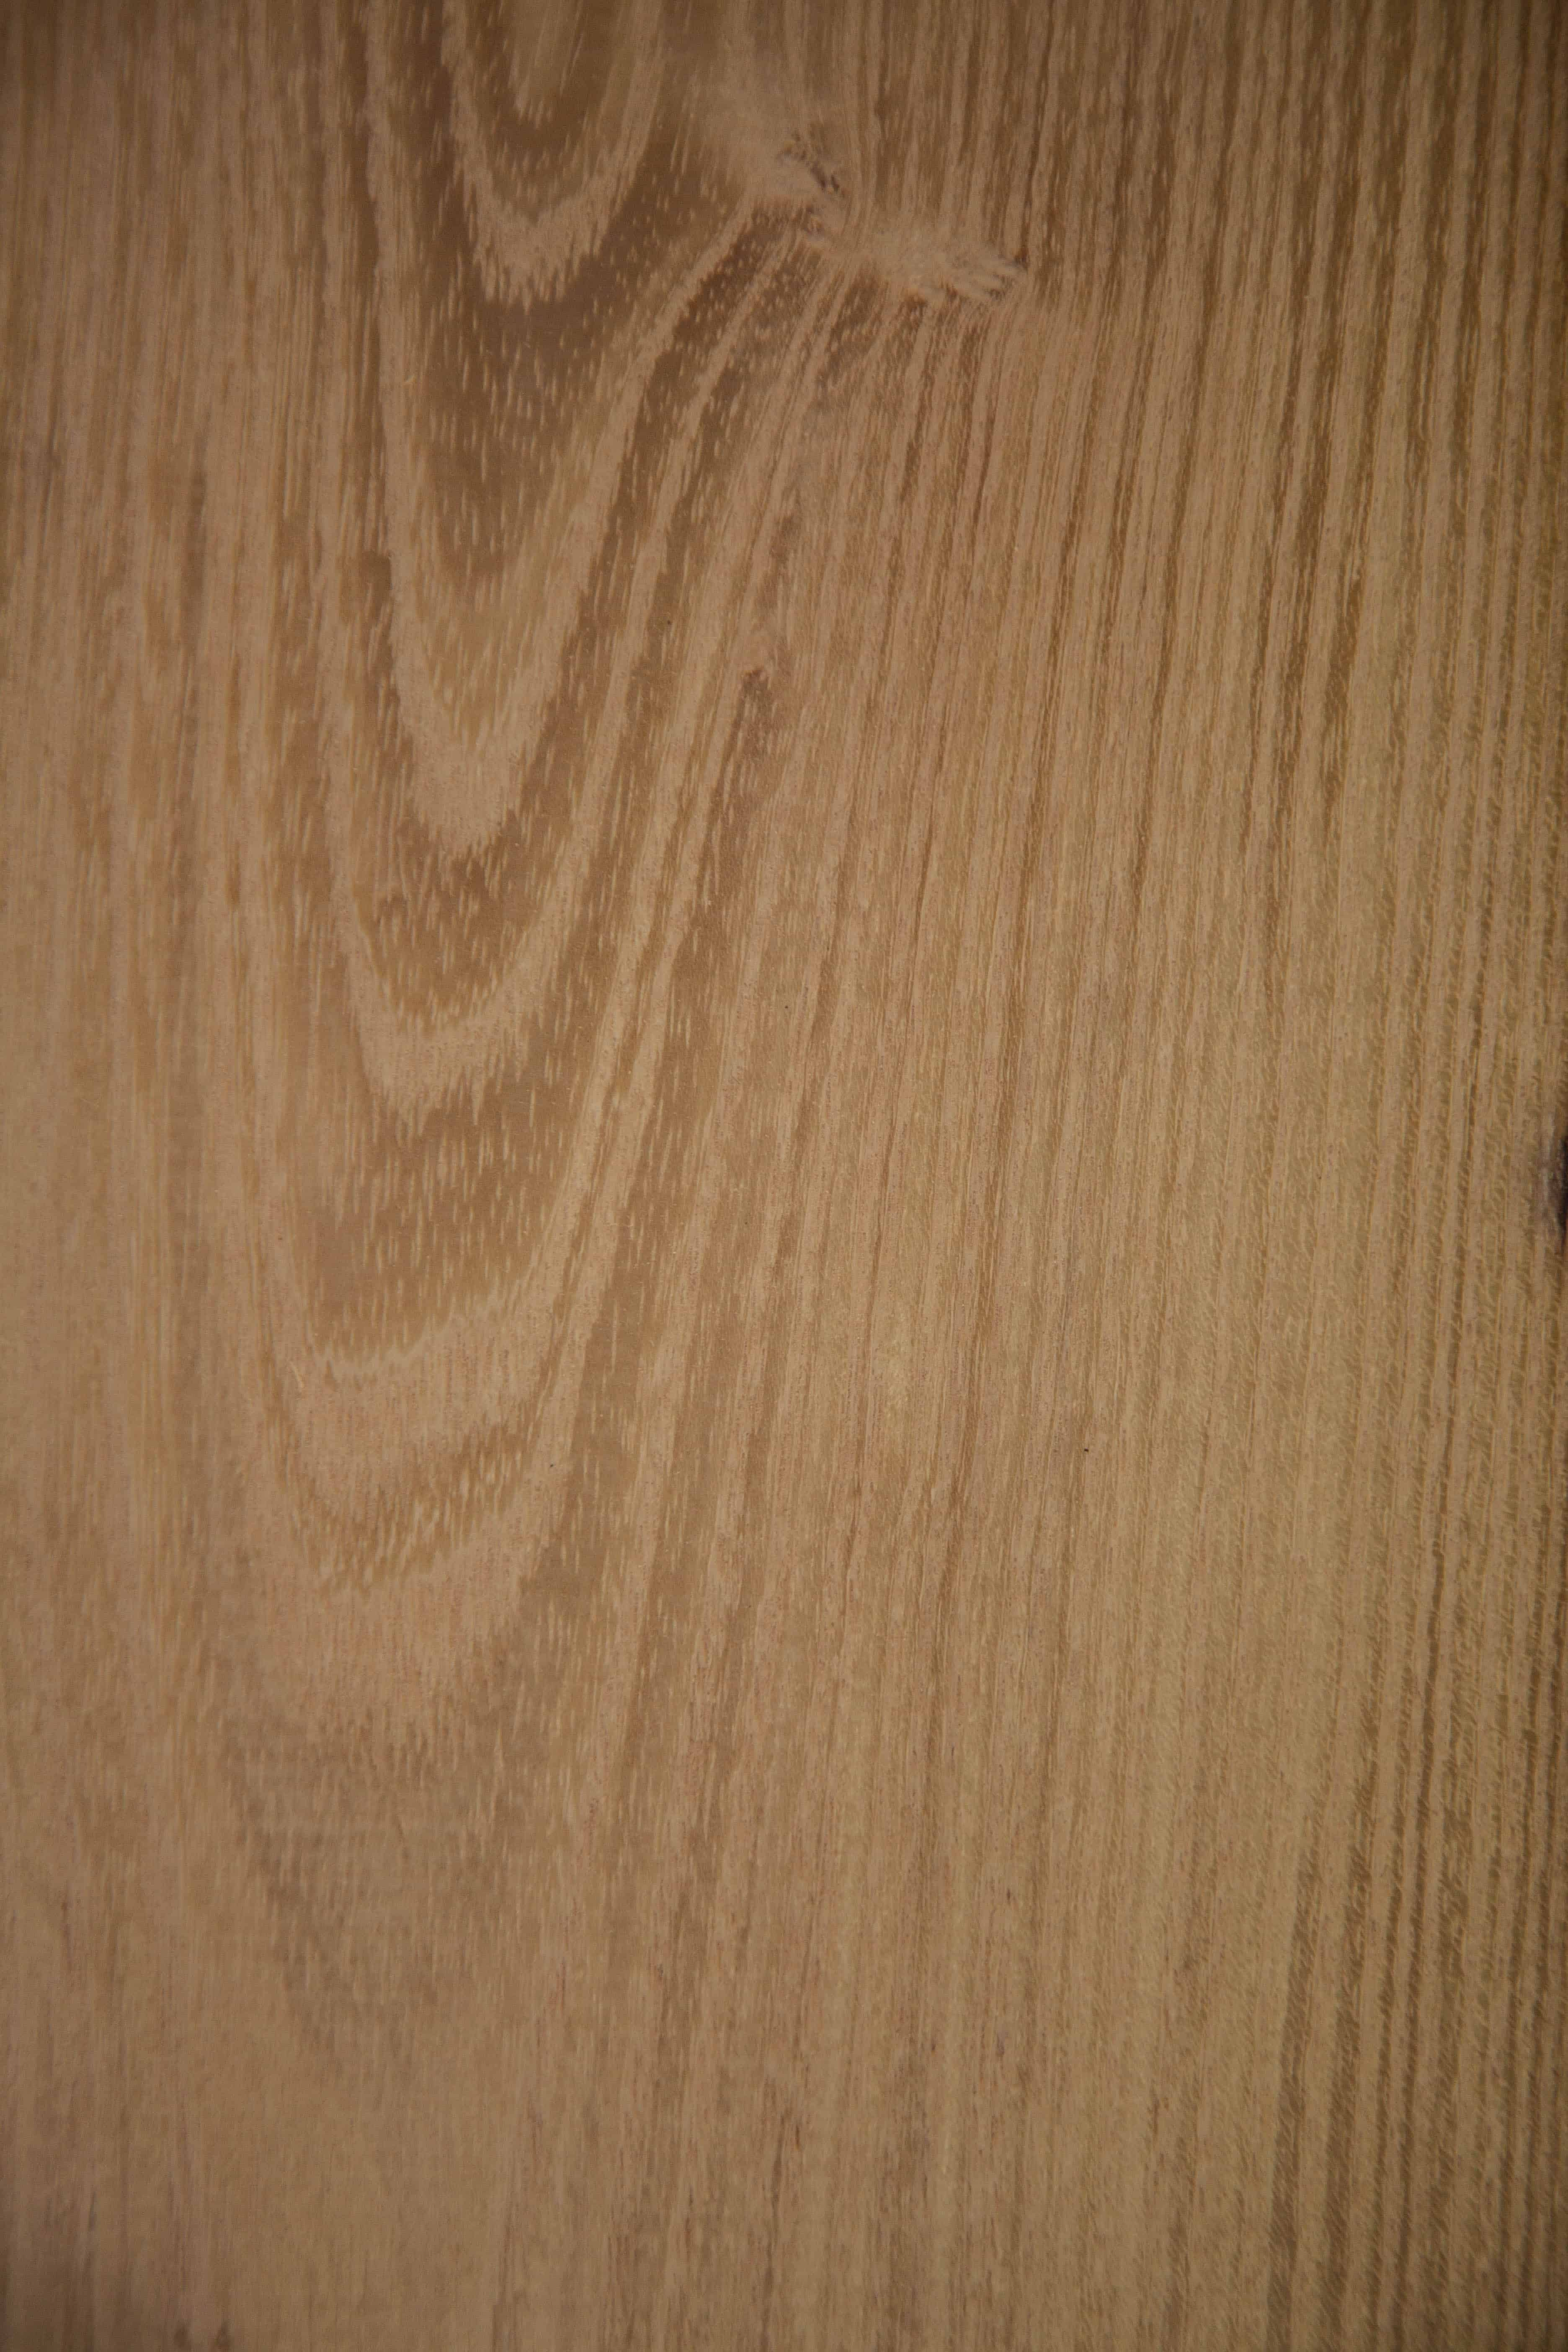 texture planche de robinier